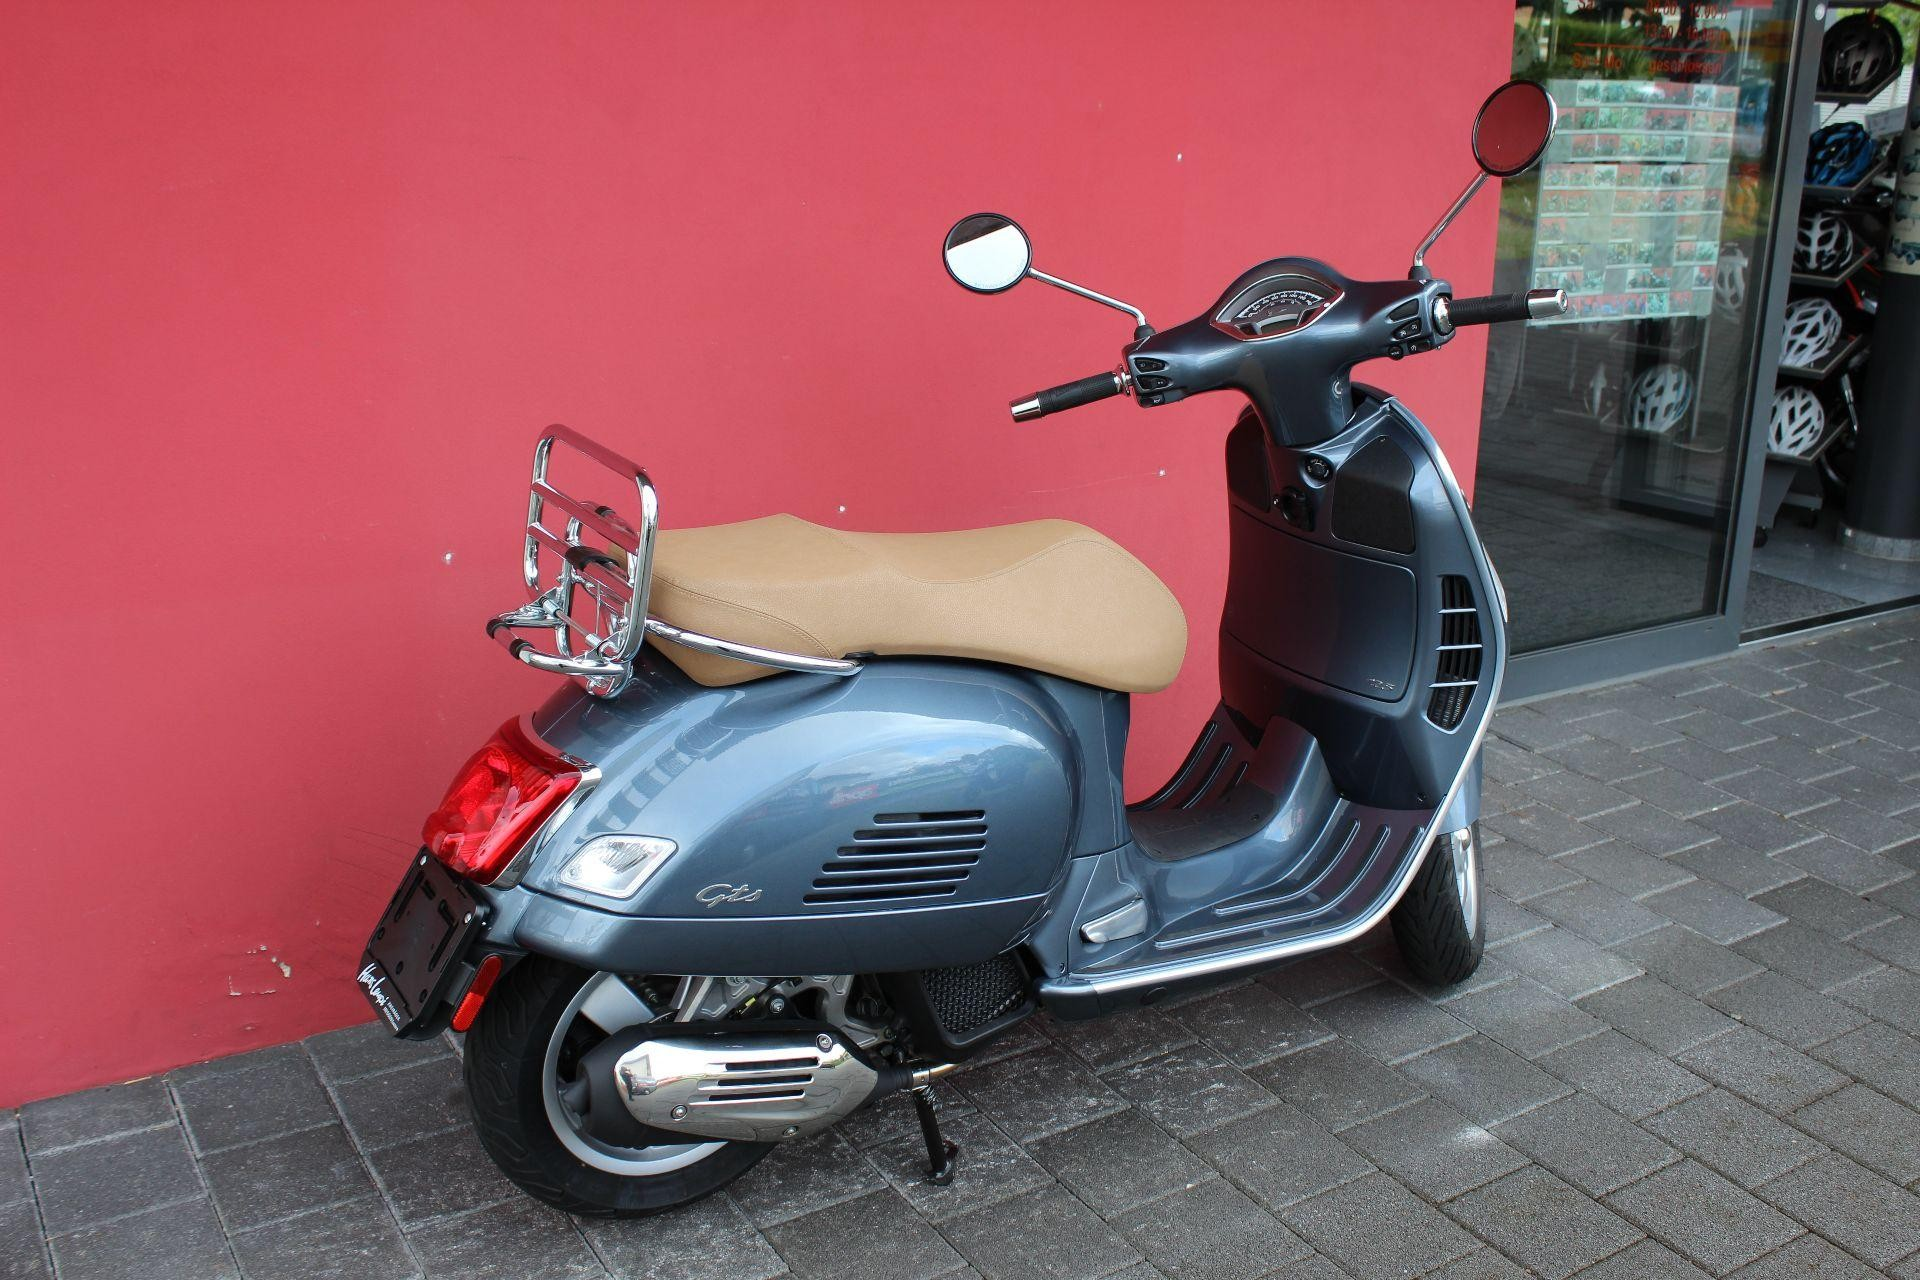 motorrad occasion kaufen piaggio vespa gts 125 hans leupi. Black Bedroom Furniture Sets. Home Design Ideas